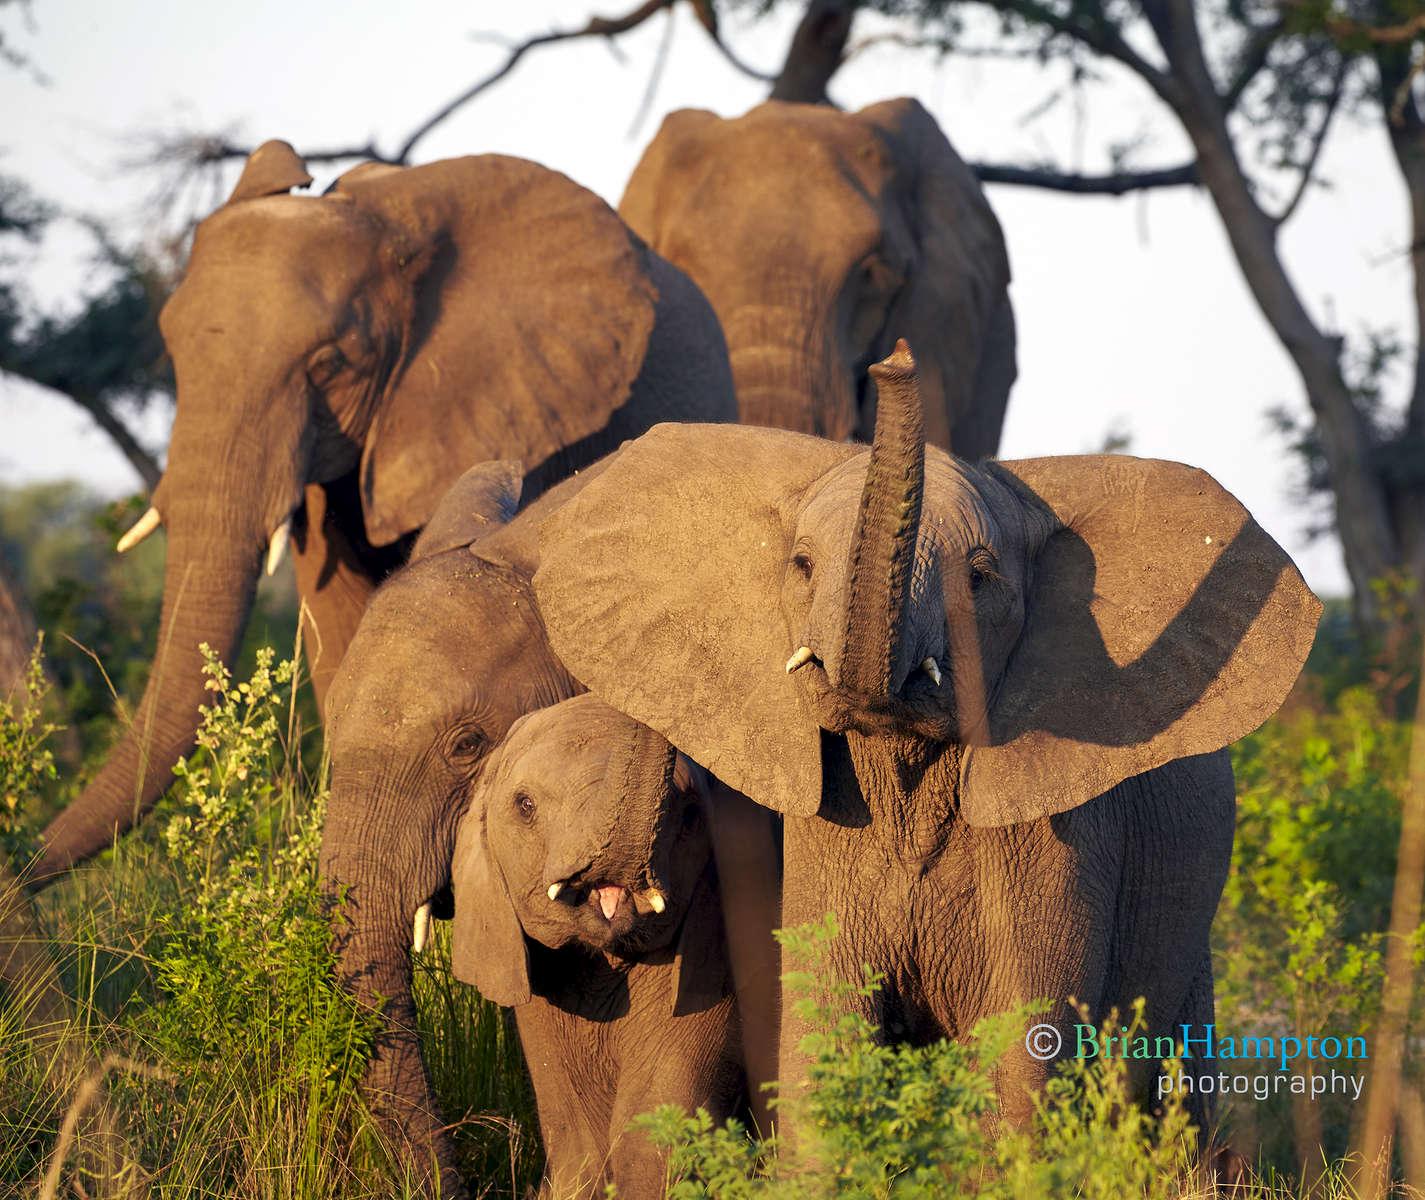 Elephants by the Zambeze